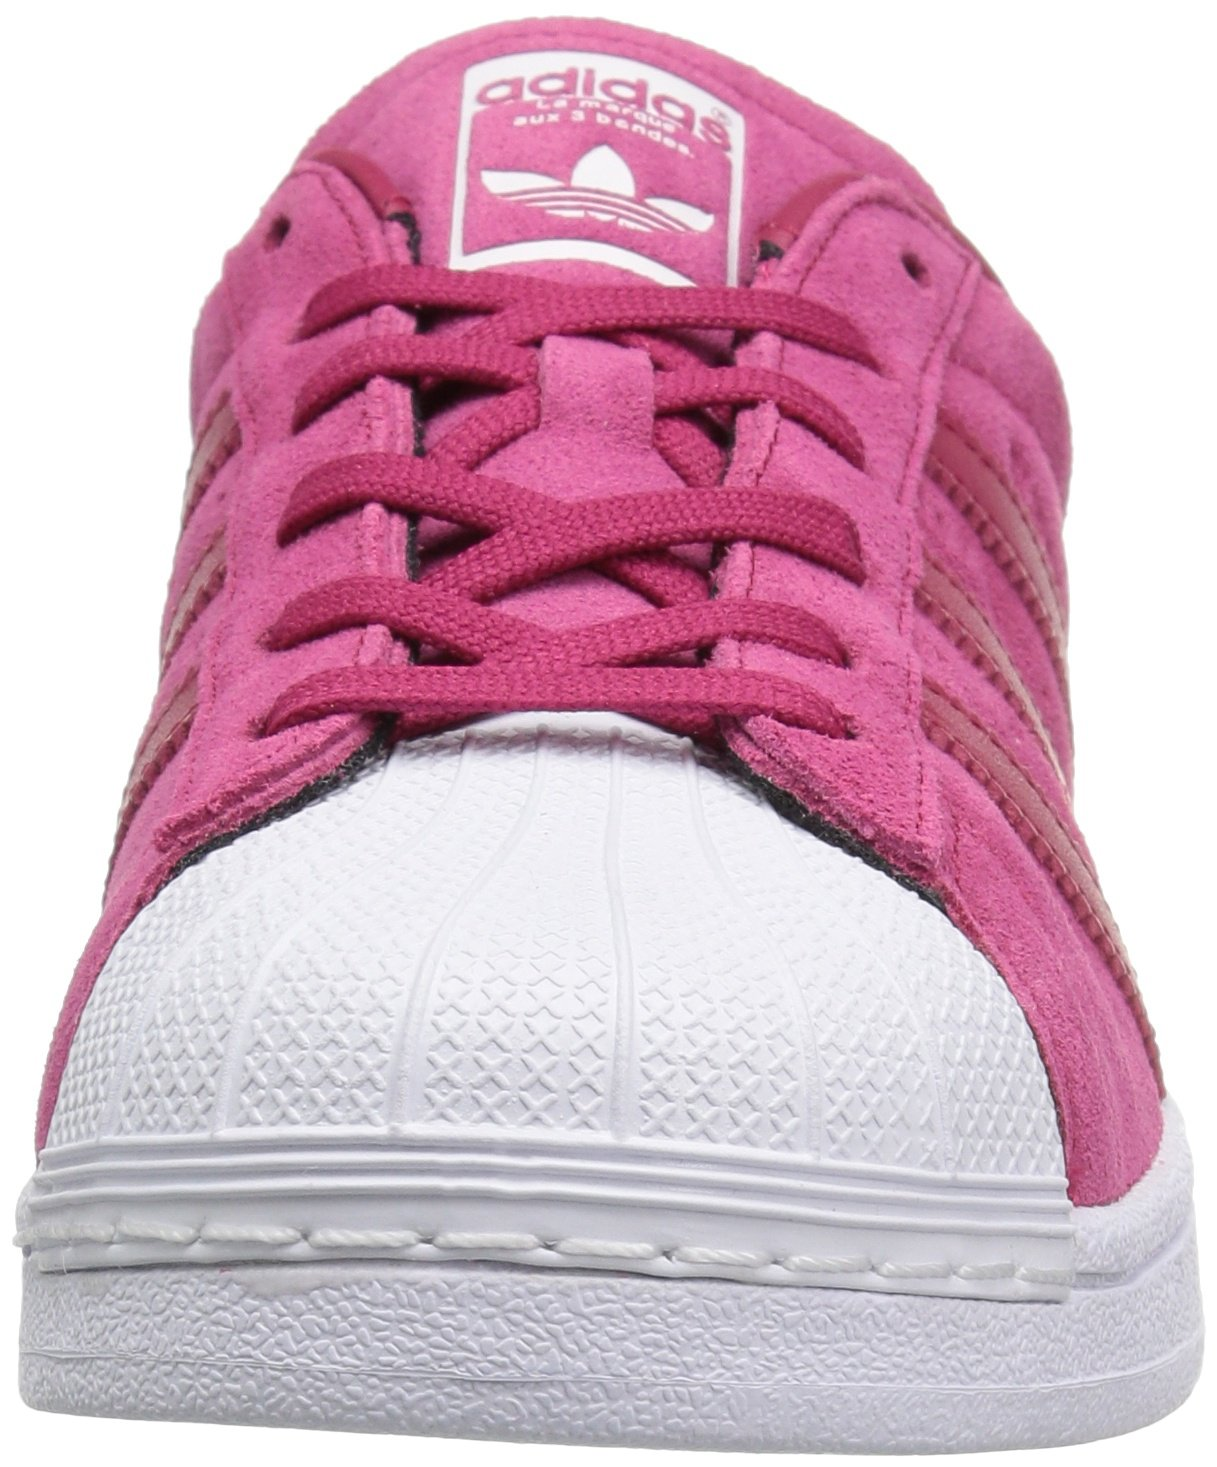 Adidas / originali originali unità superstar unità unità 19996 rosa